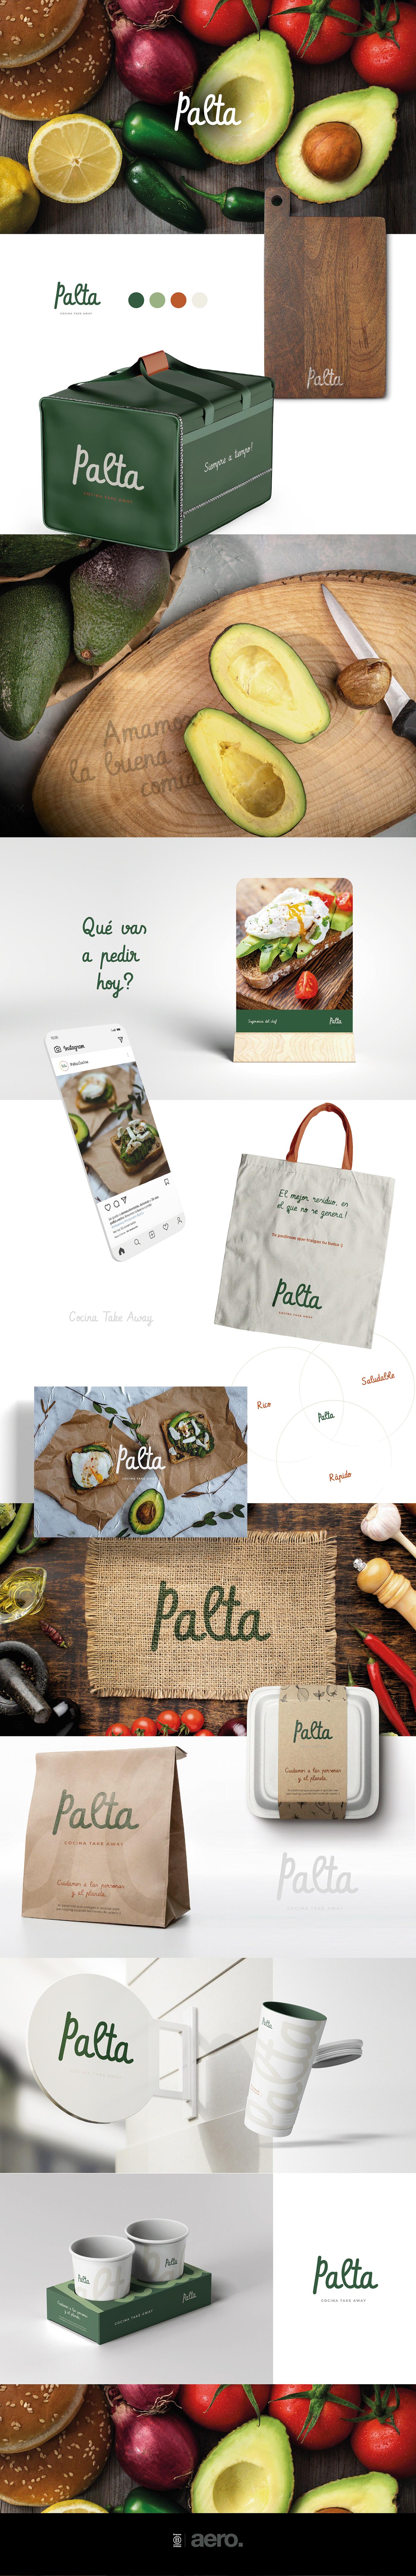 argentina brand branding  buenos aires circular economy cordoba diseño economia circular marca Sustainable Branding